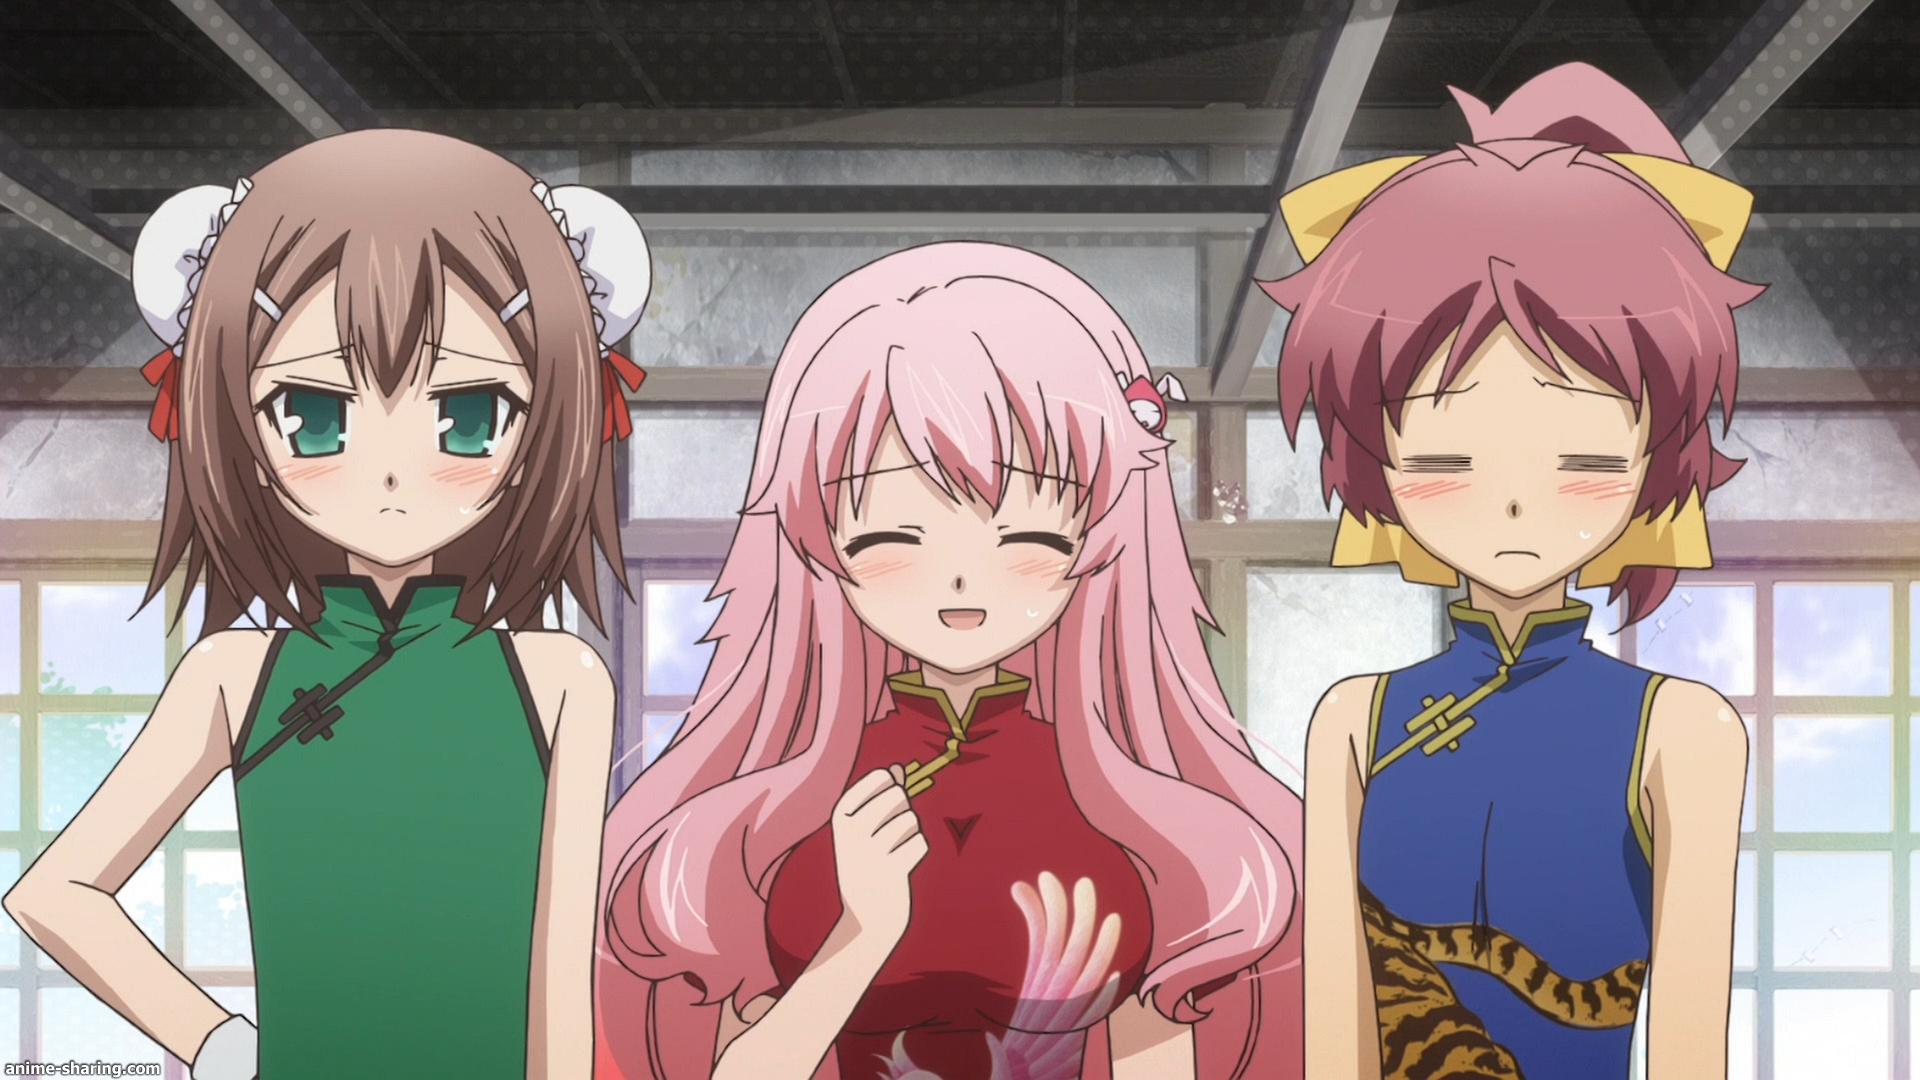 Baka to Test to Shoukanjuu Ni!: Temporada 2 ⋆ Anime Online Sub